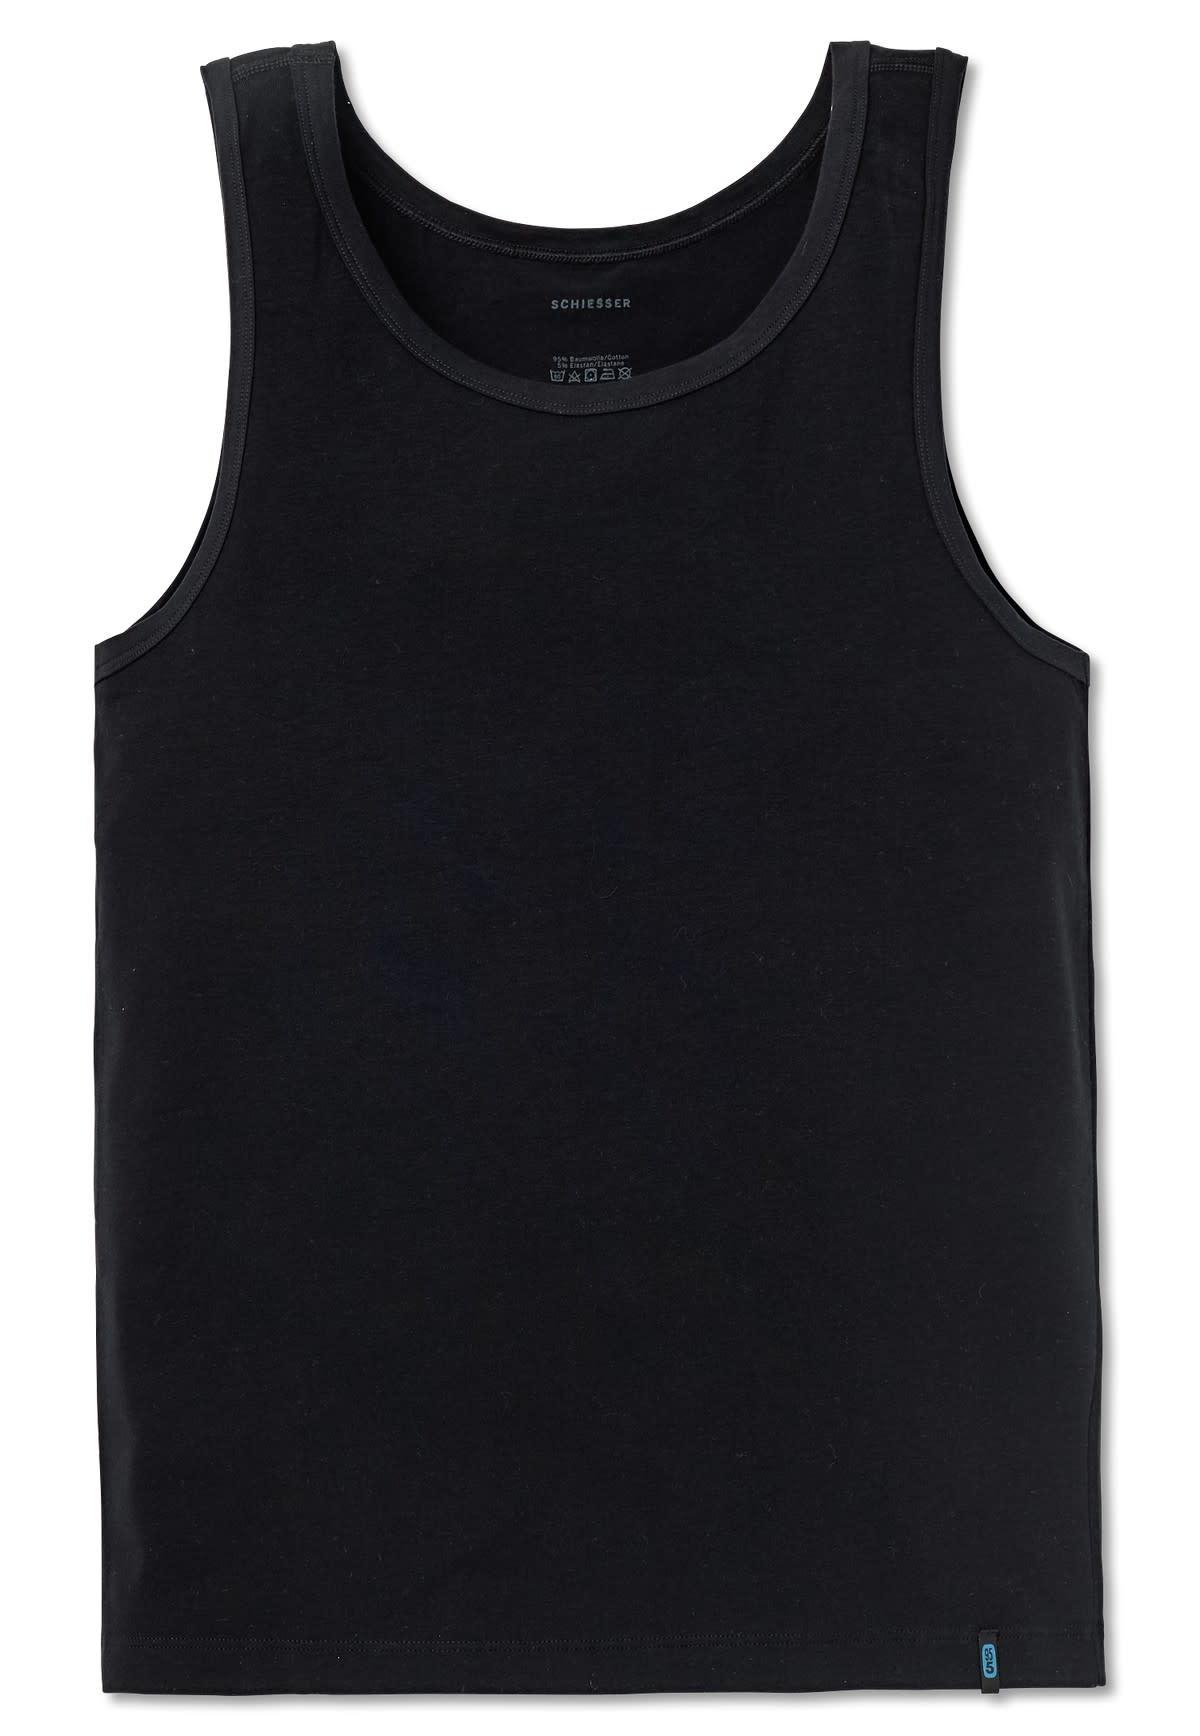 Singlet 95/5 205428 - zwart-3